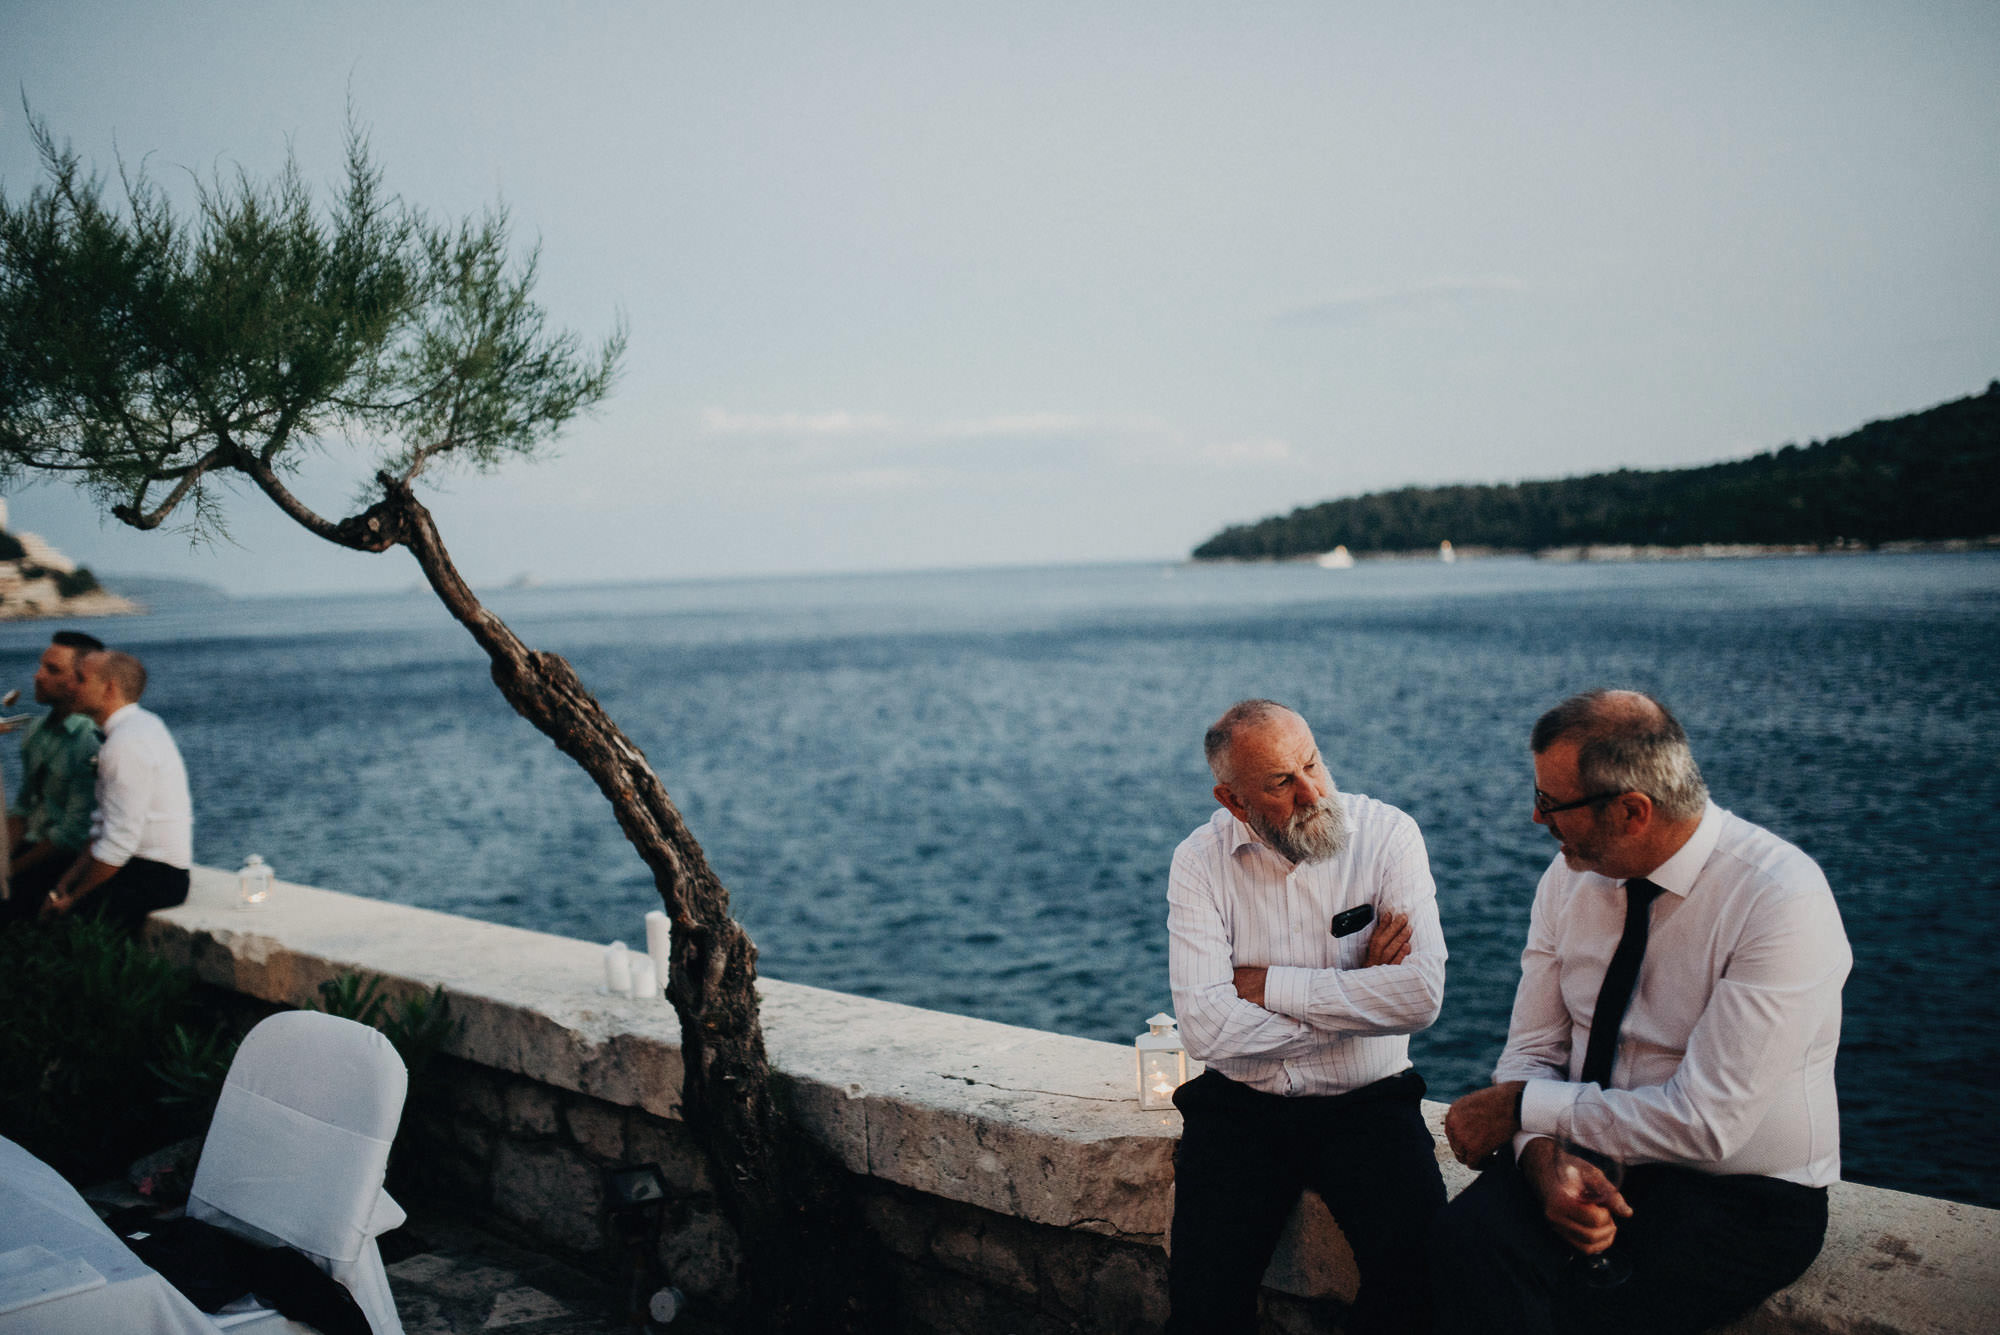 dubrovnik_croatia_wedding_photographer-jere_satamo-destination_weddings-076-web.jpg